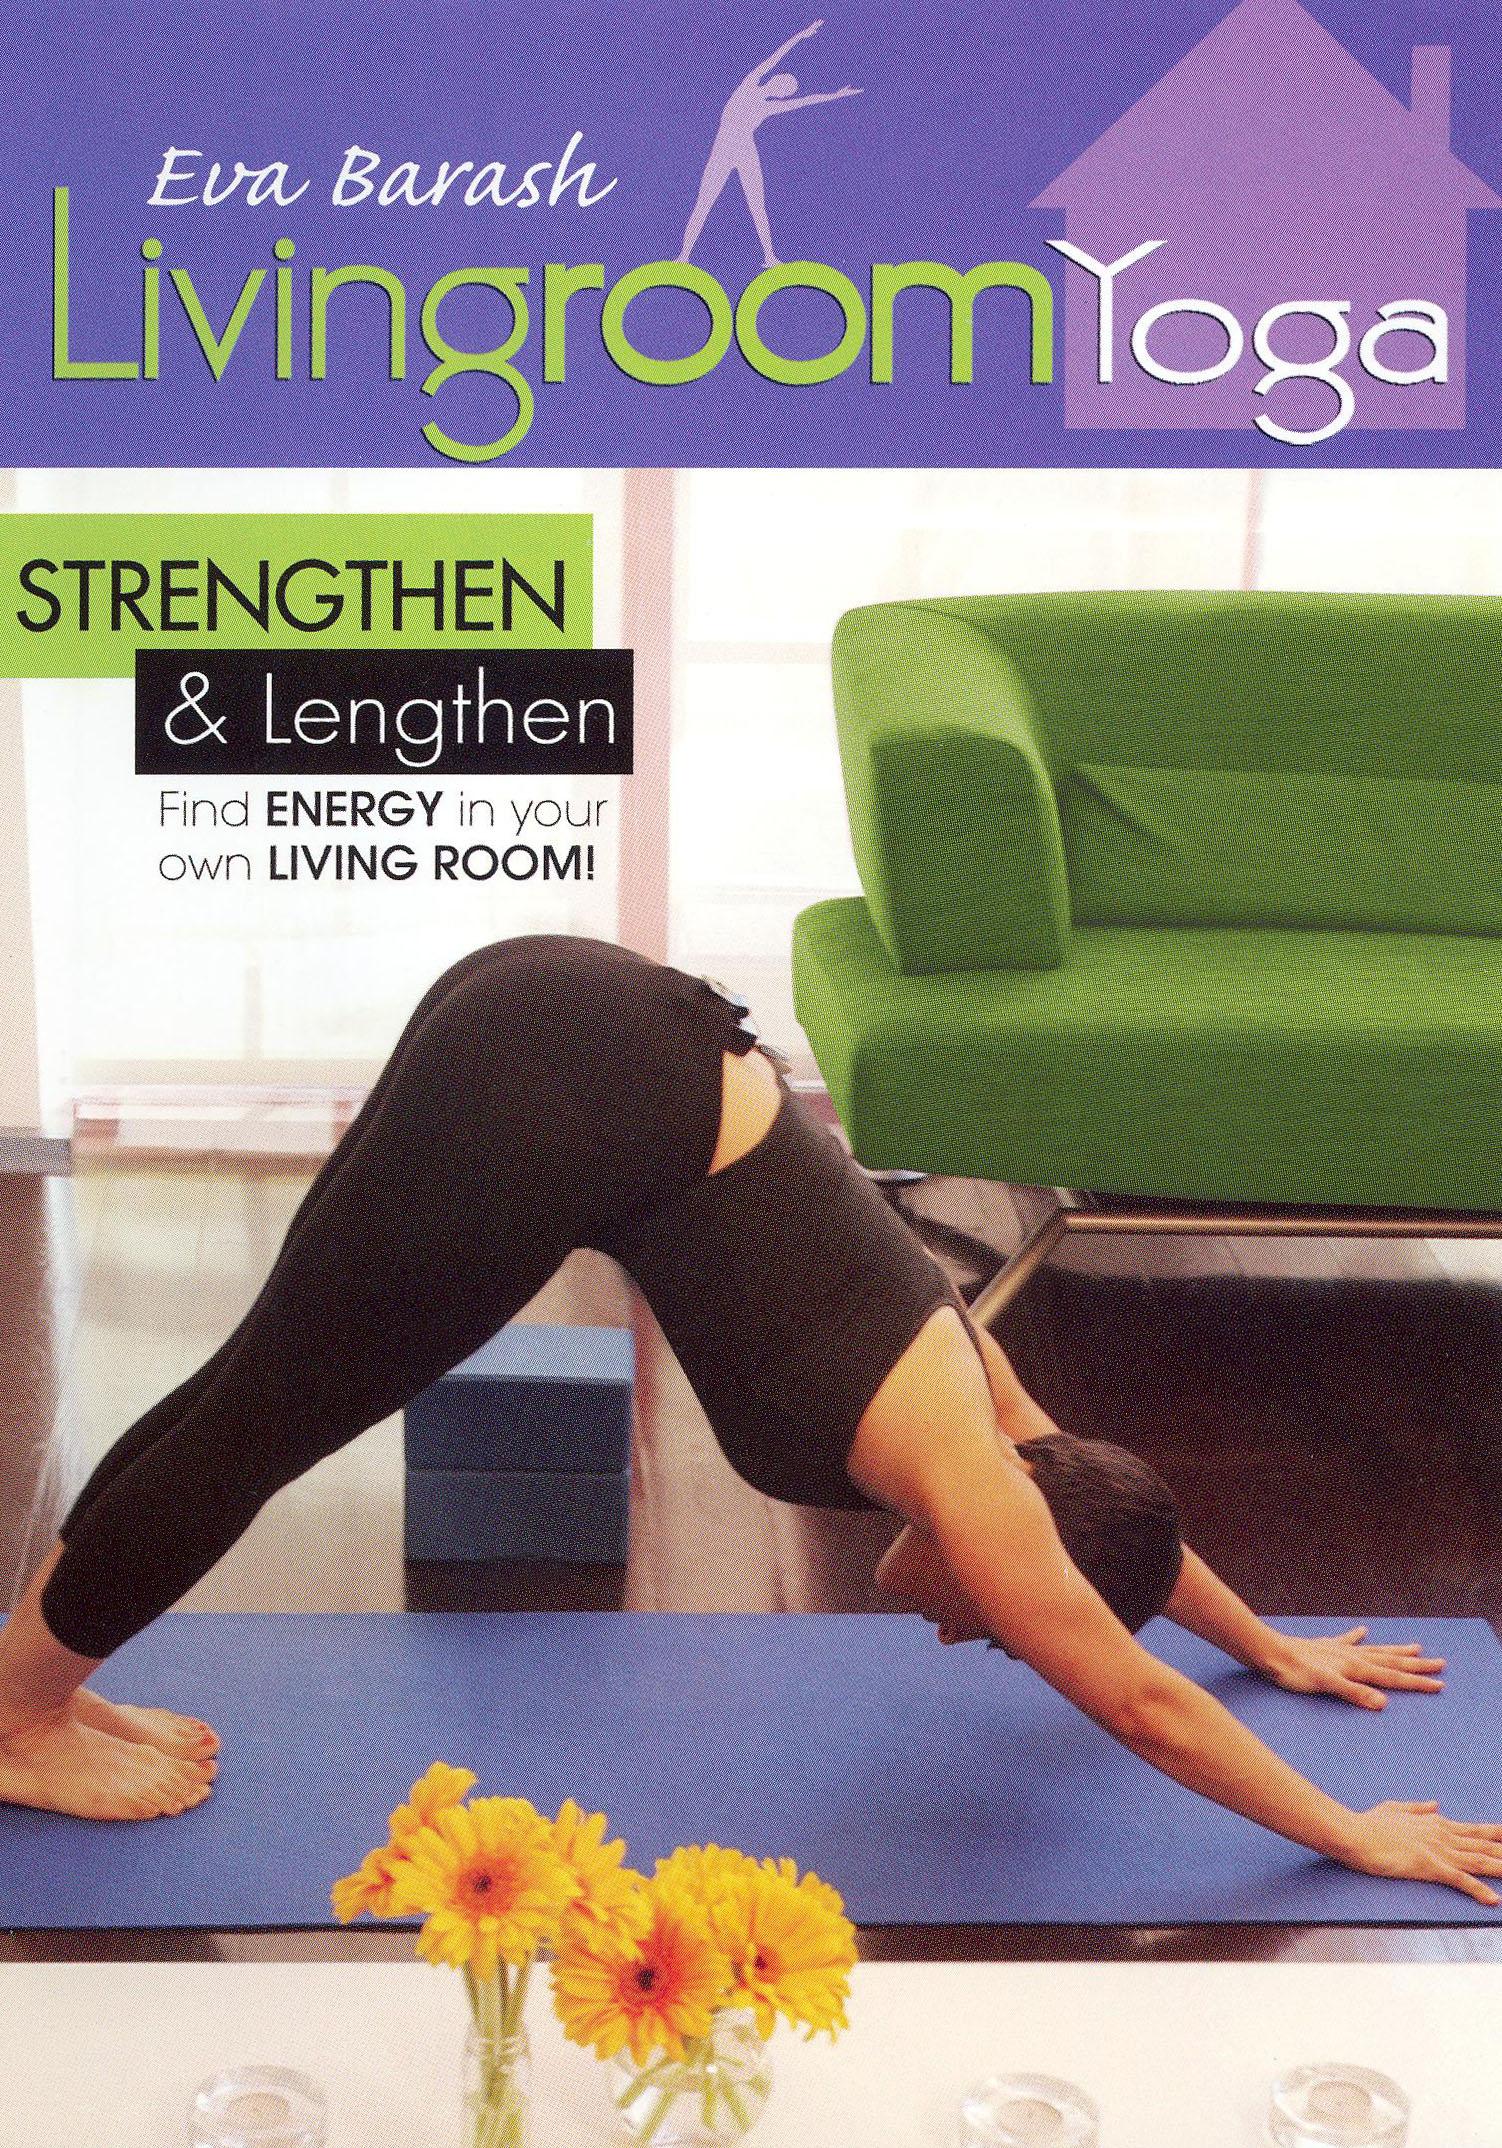 Eva Barash Living Room Yoga